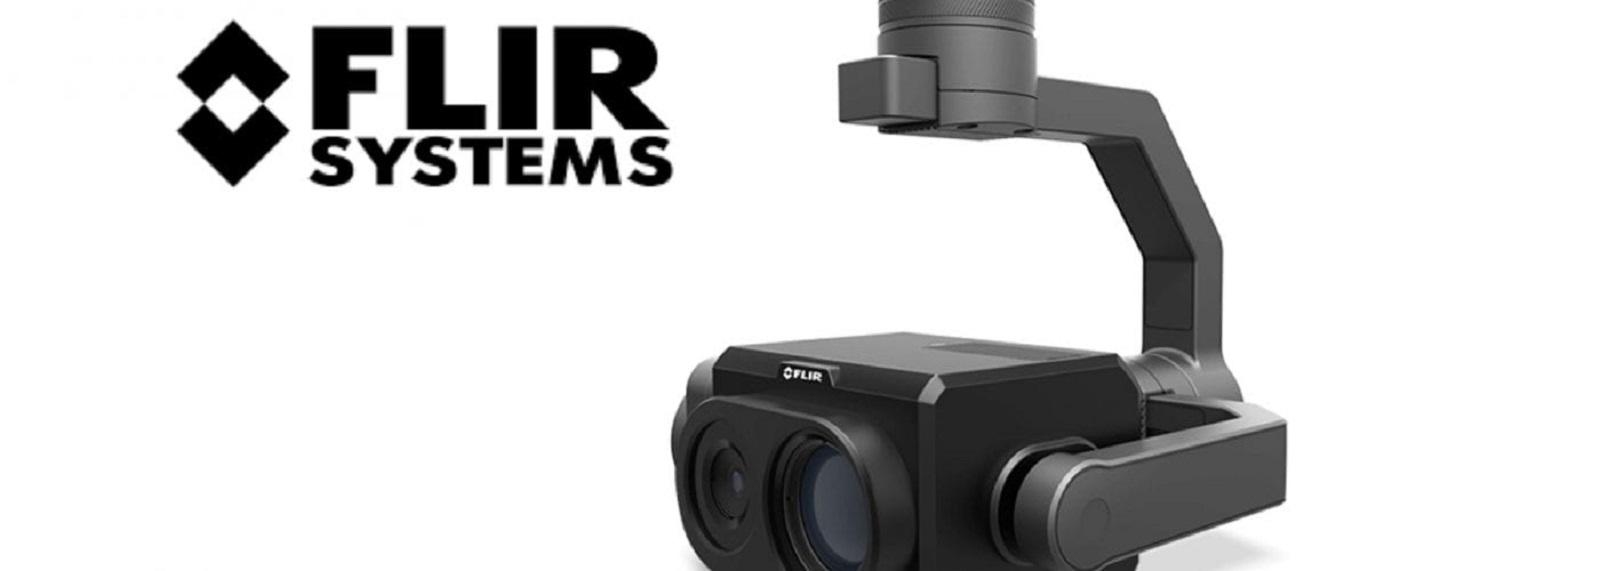 Новая тепловизионная камера FLIR Vue TZ20 представлена на DJI AirWorks 2020